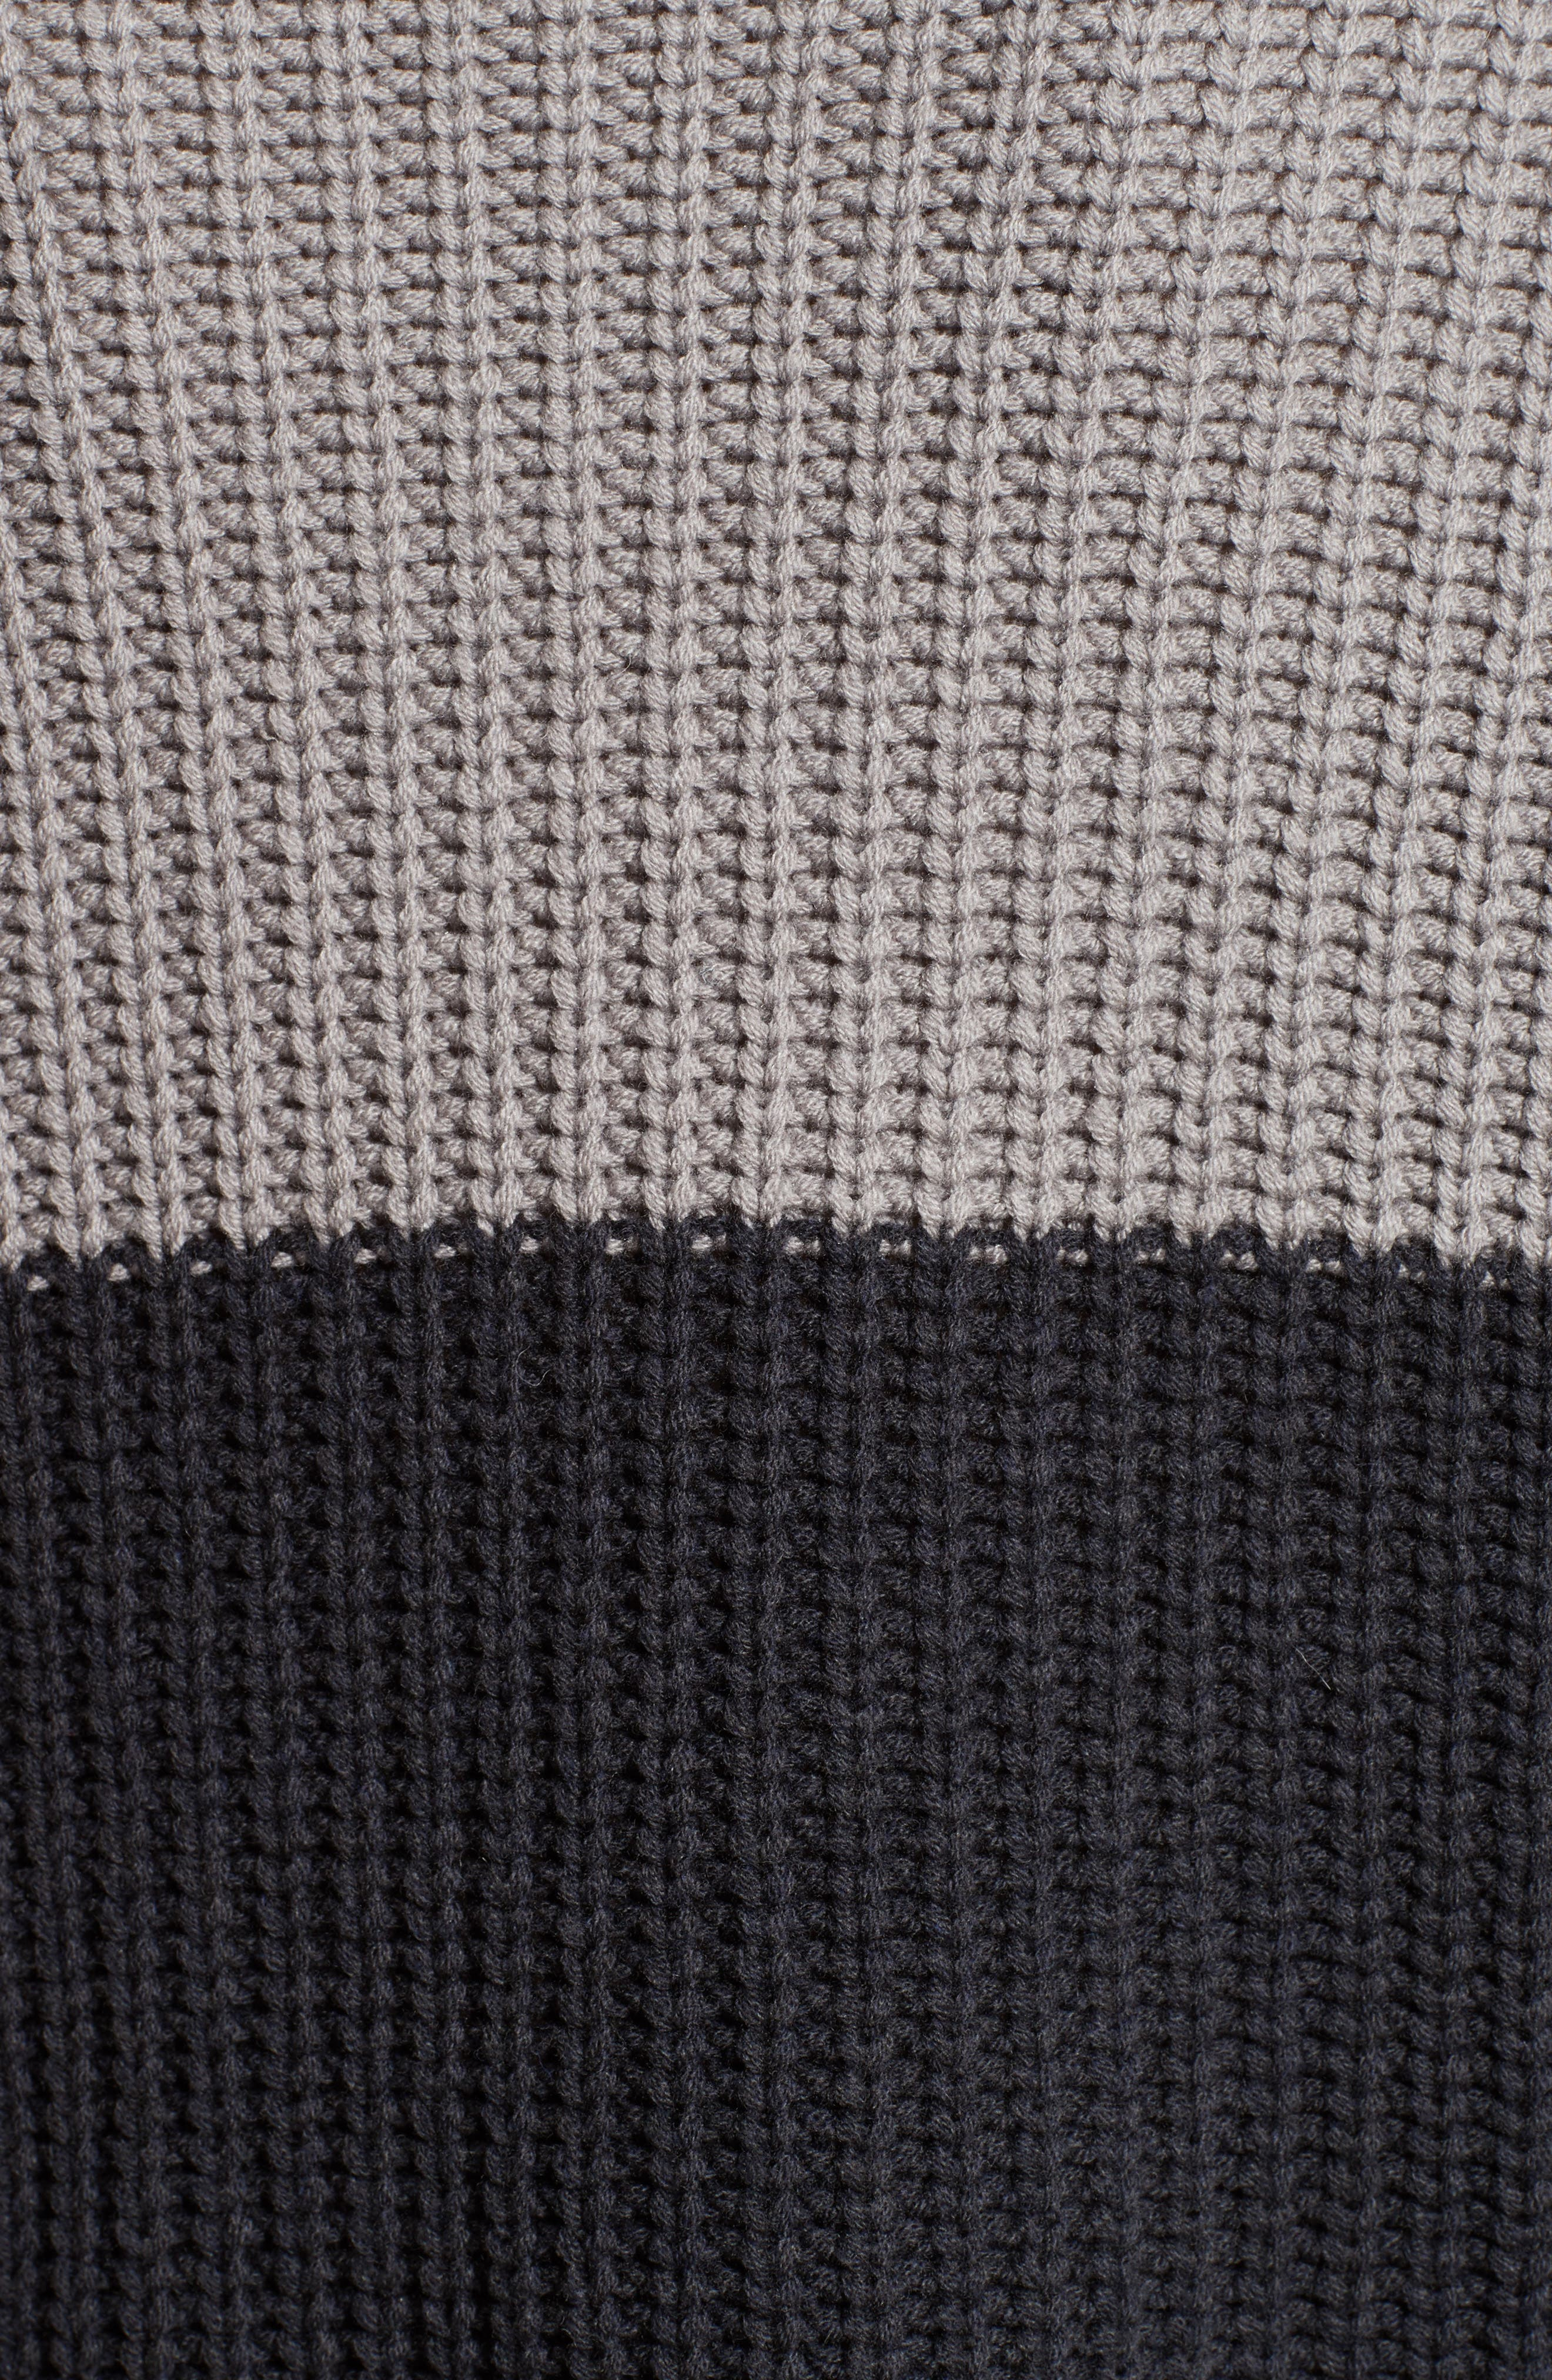 Ribbed Colorblock Sweater,                             Alternate thumbnail 3, color,                             Grey Multi